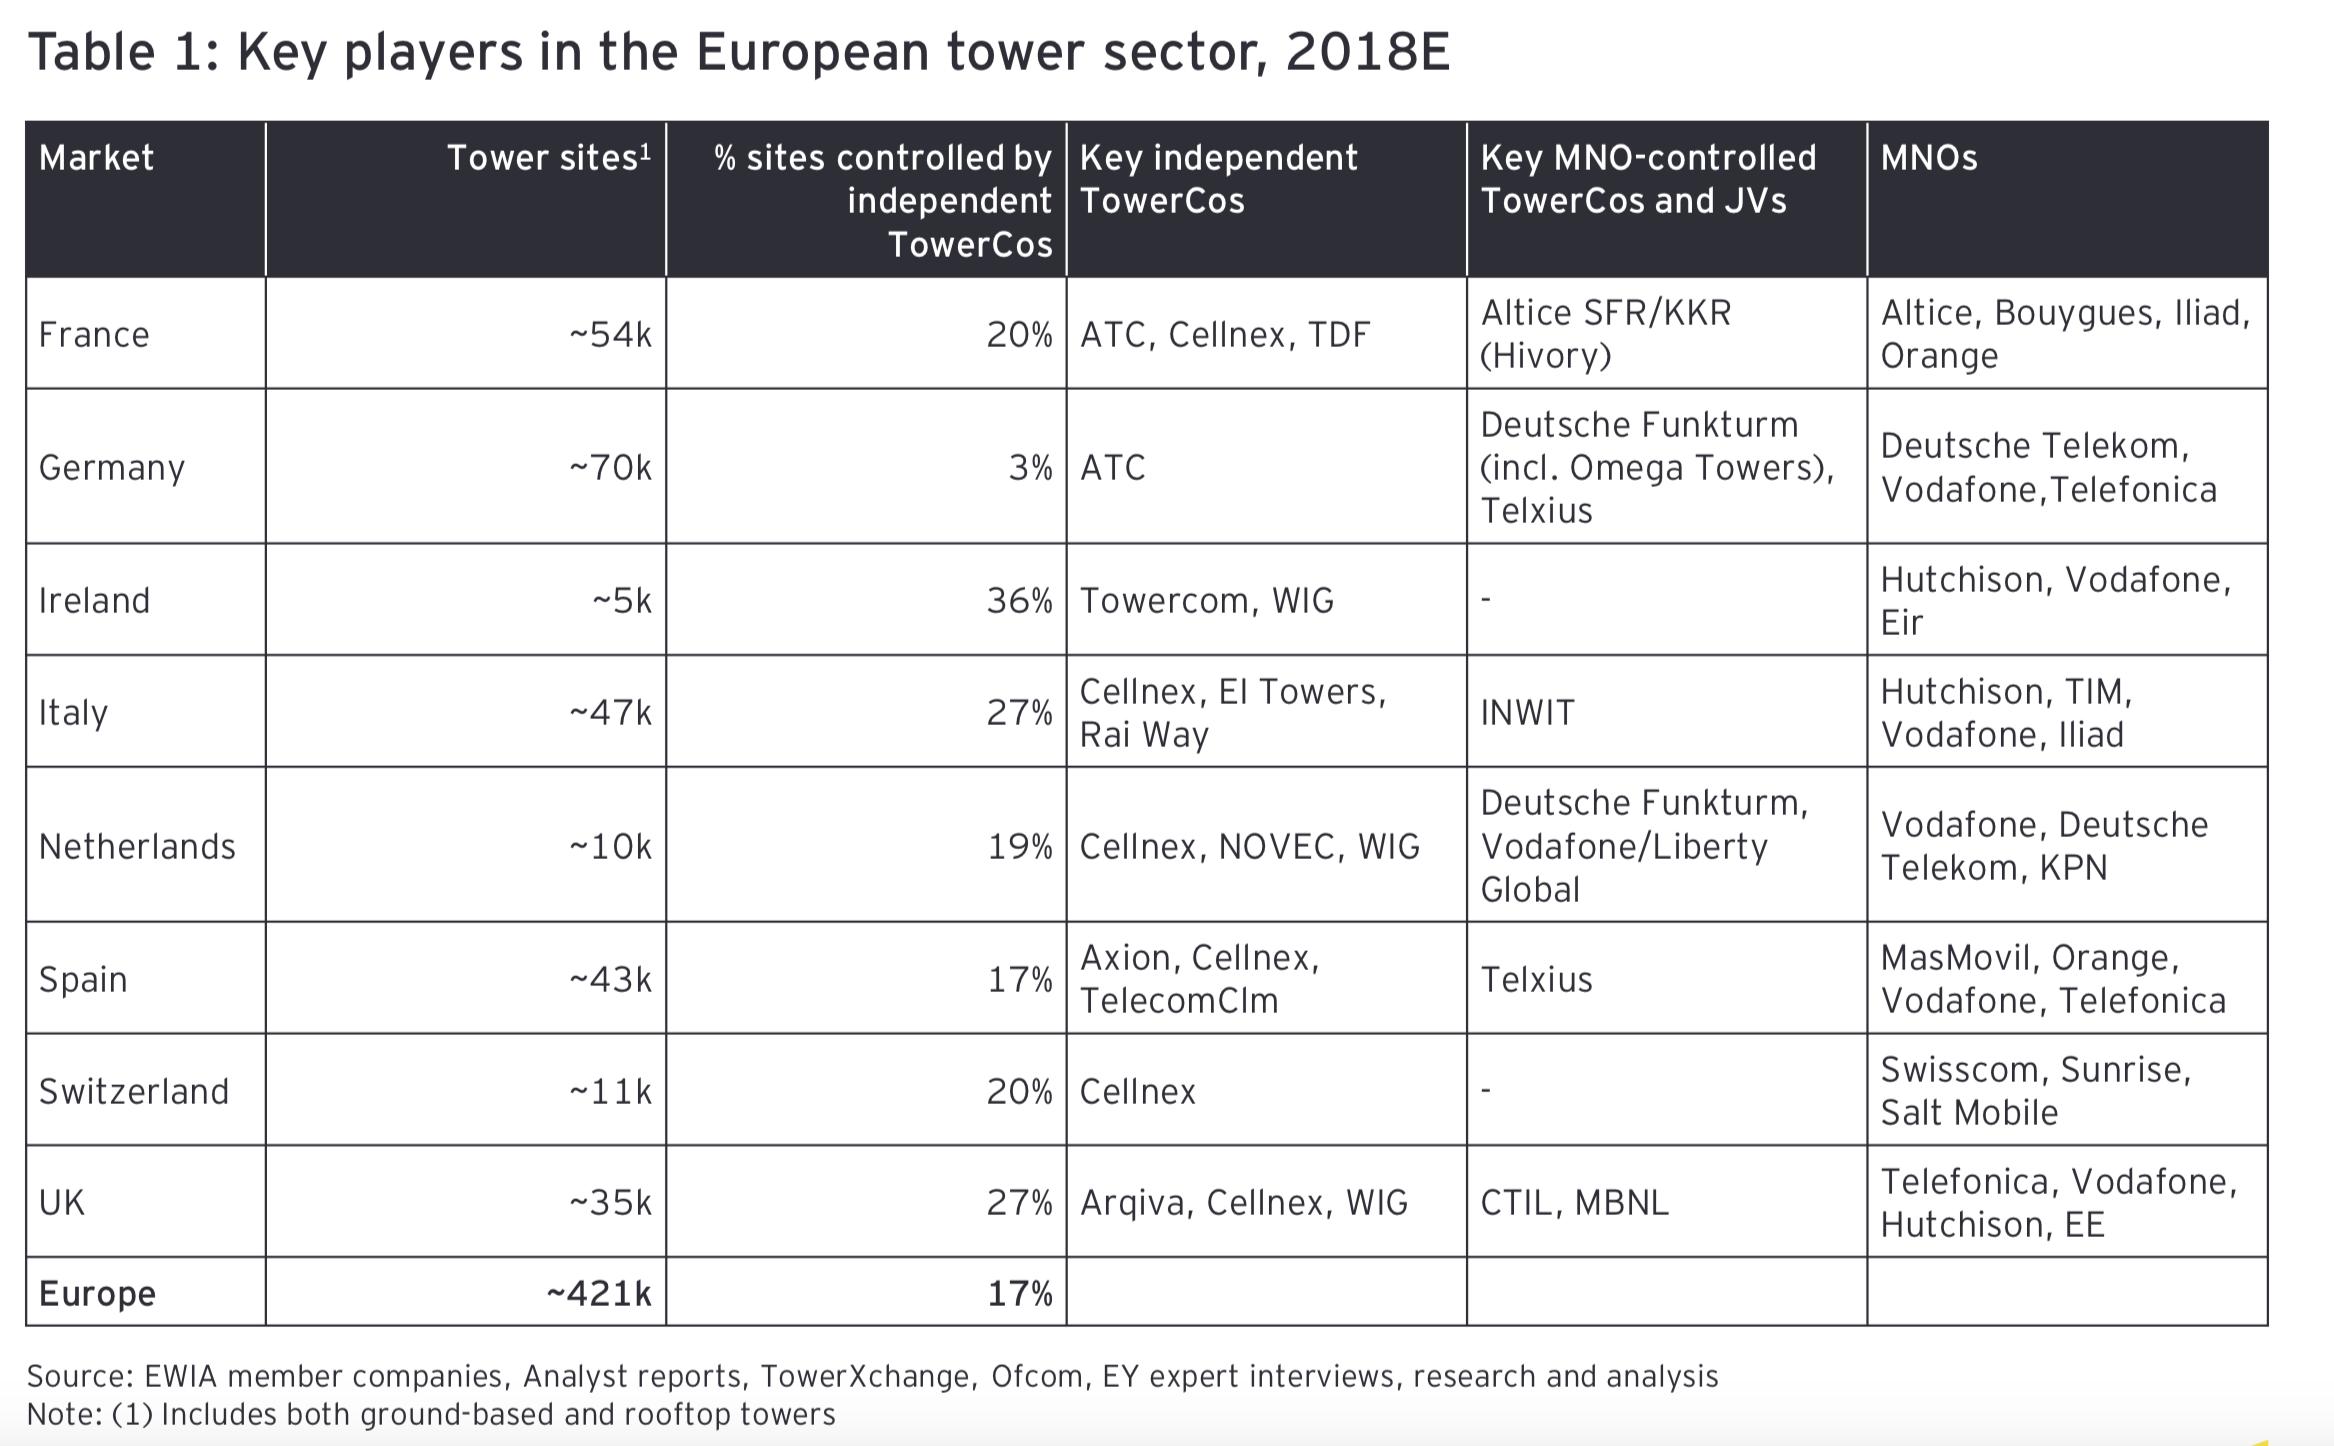 Source: European Wireless Infrastructure Association, Ernst & Young.